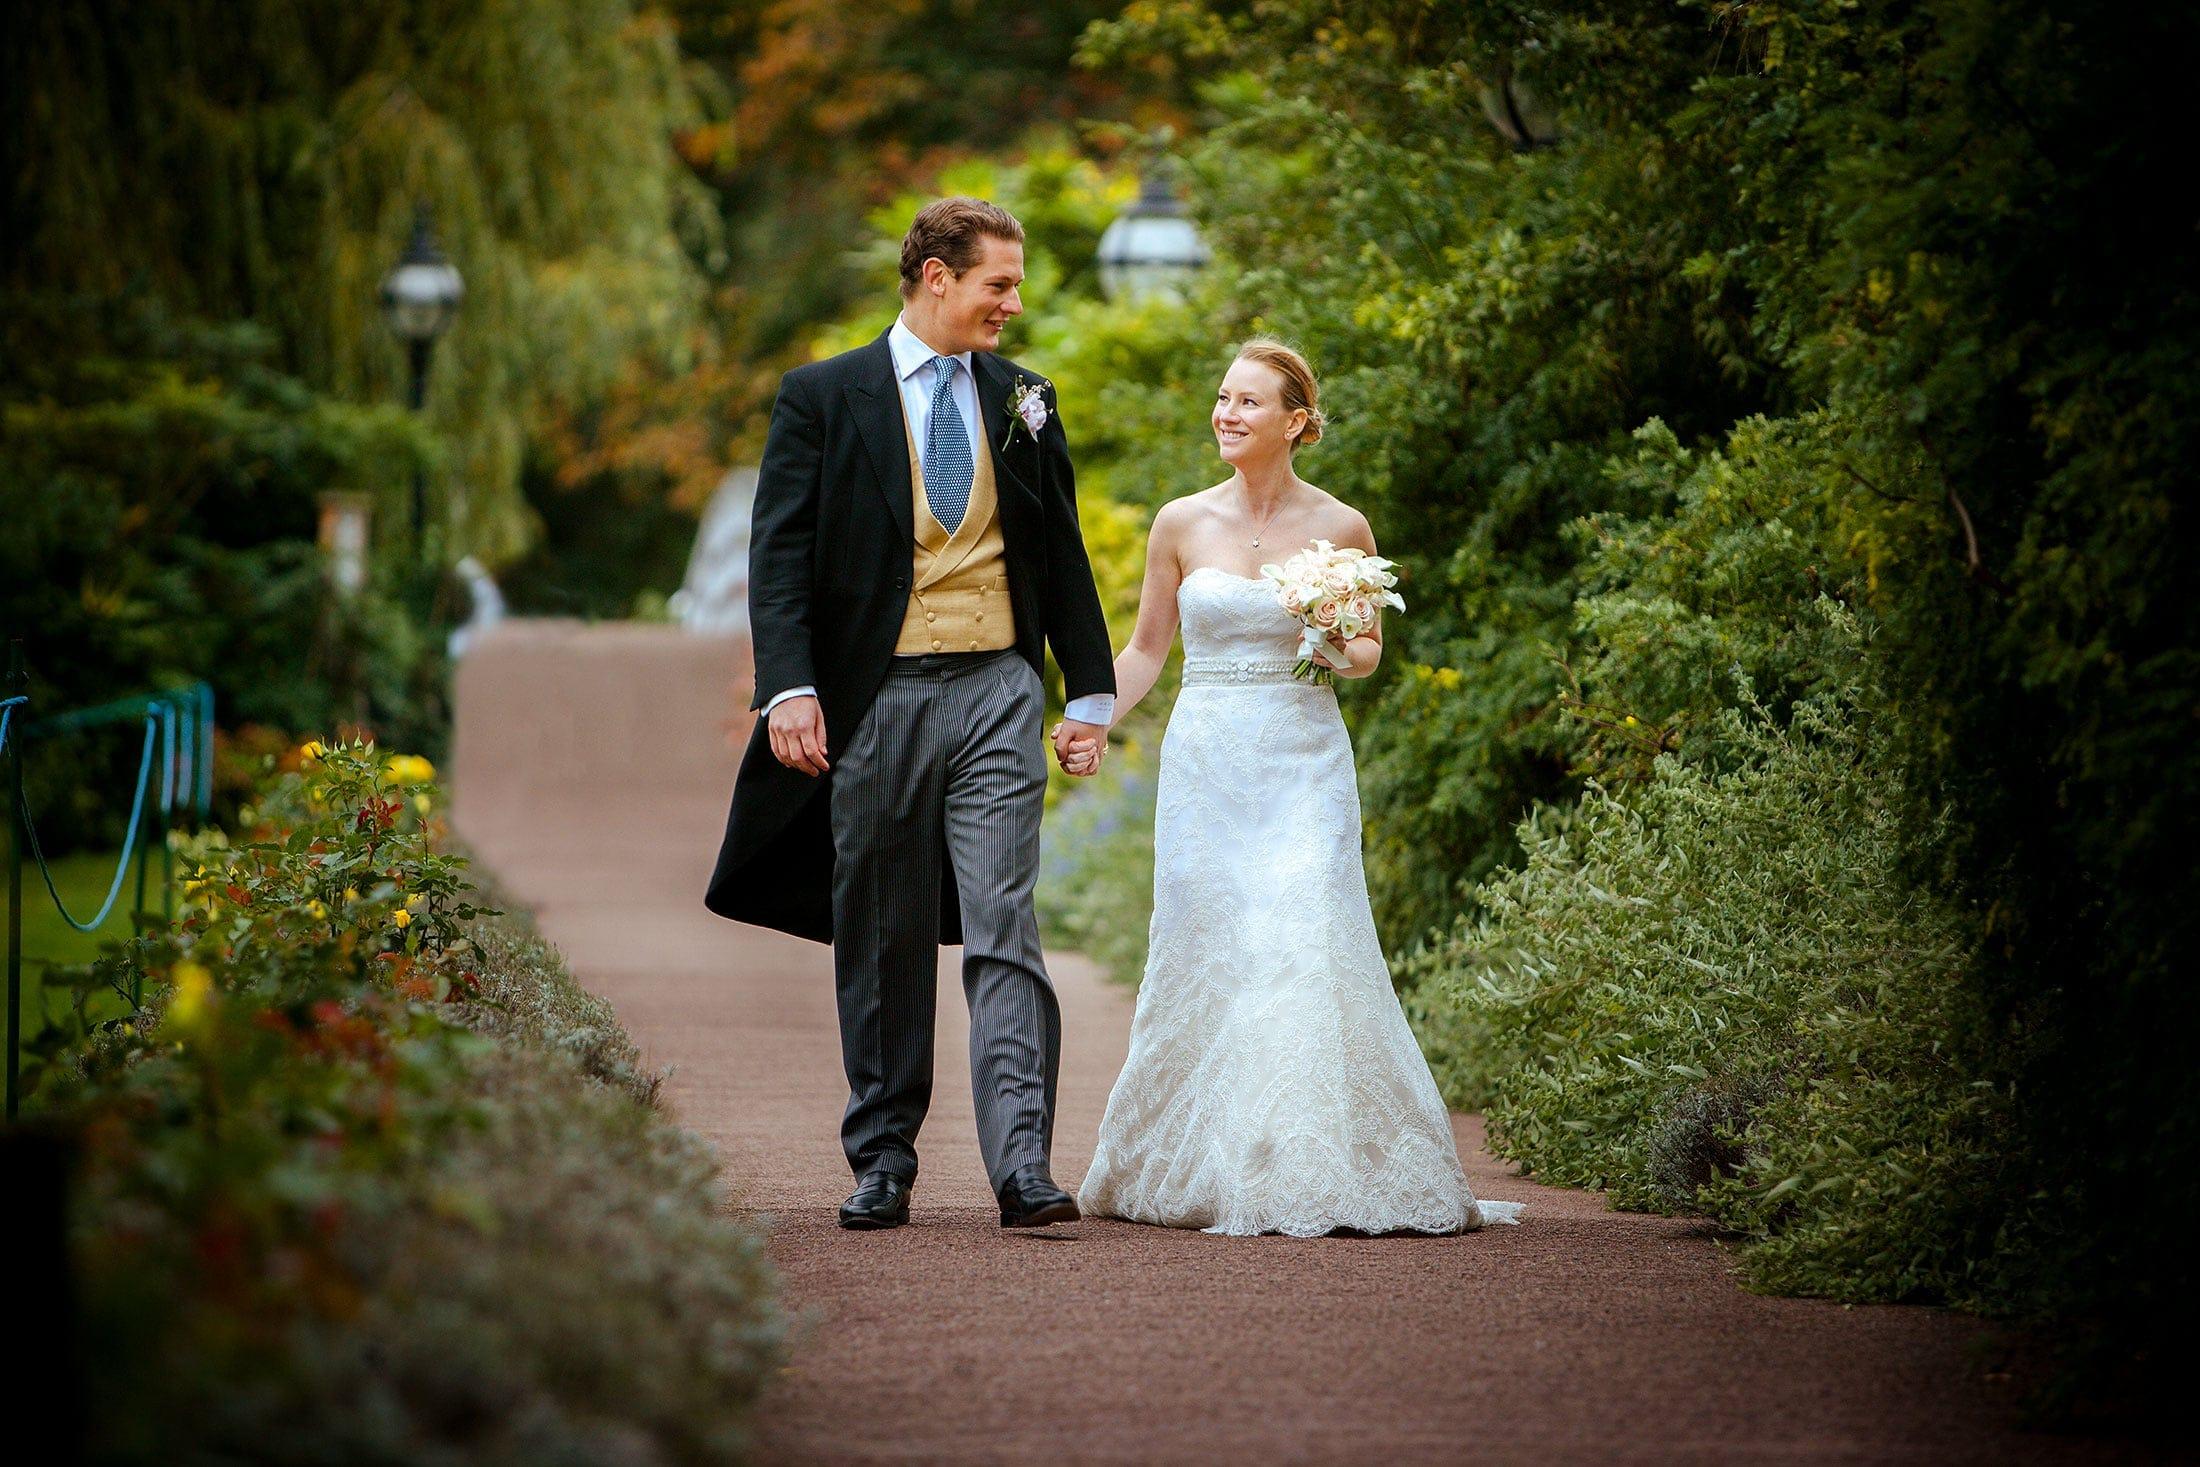 Hurlingham wedding photographer | Sarah & Alex